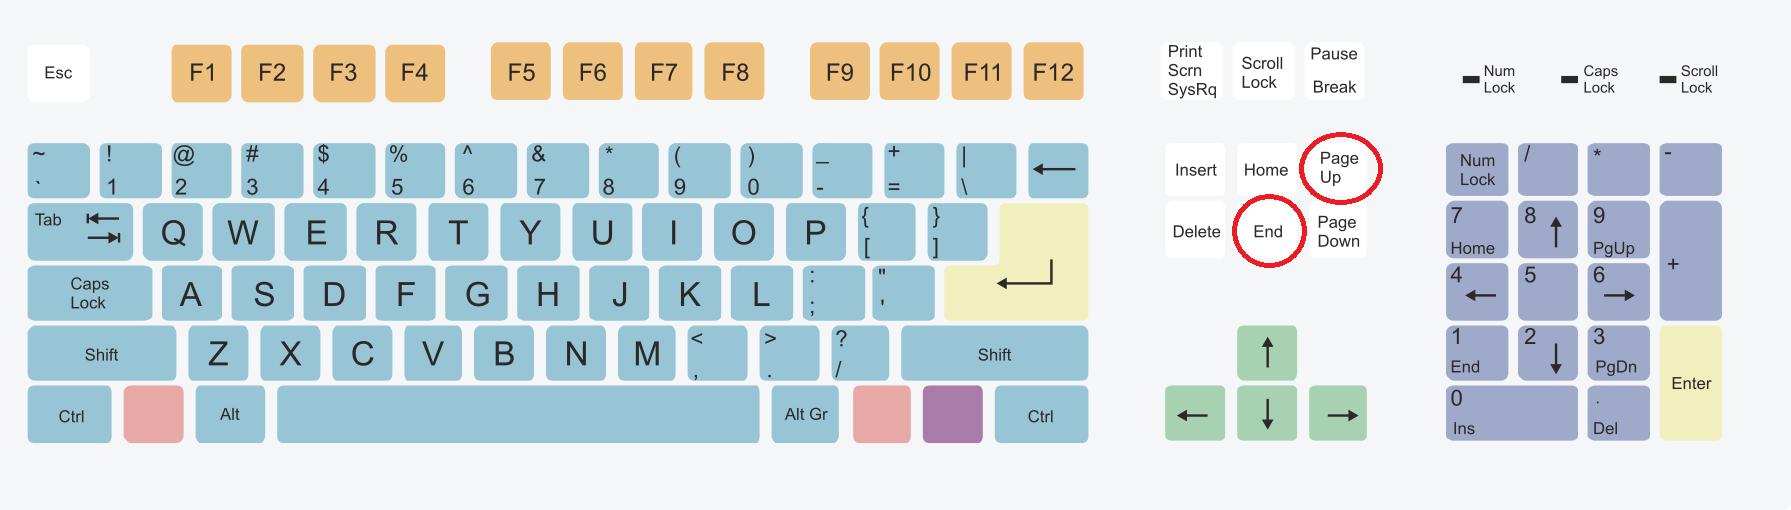 She Will Punish Them - Keyboard Shortcut Cheat Menu Guide - Instructions - F340794